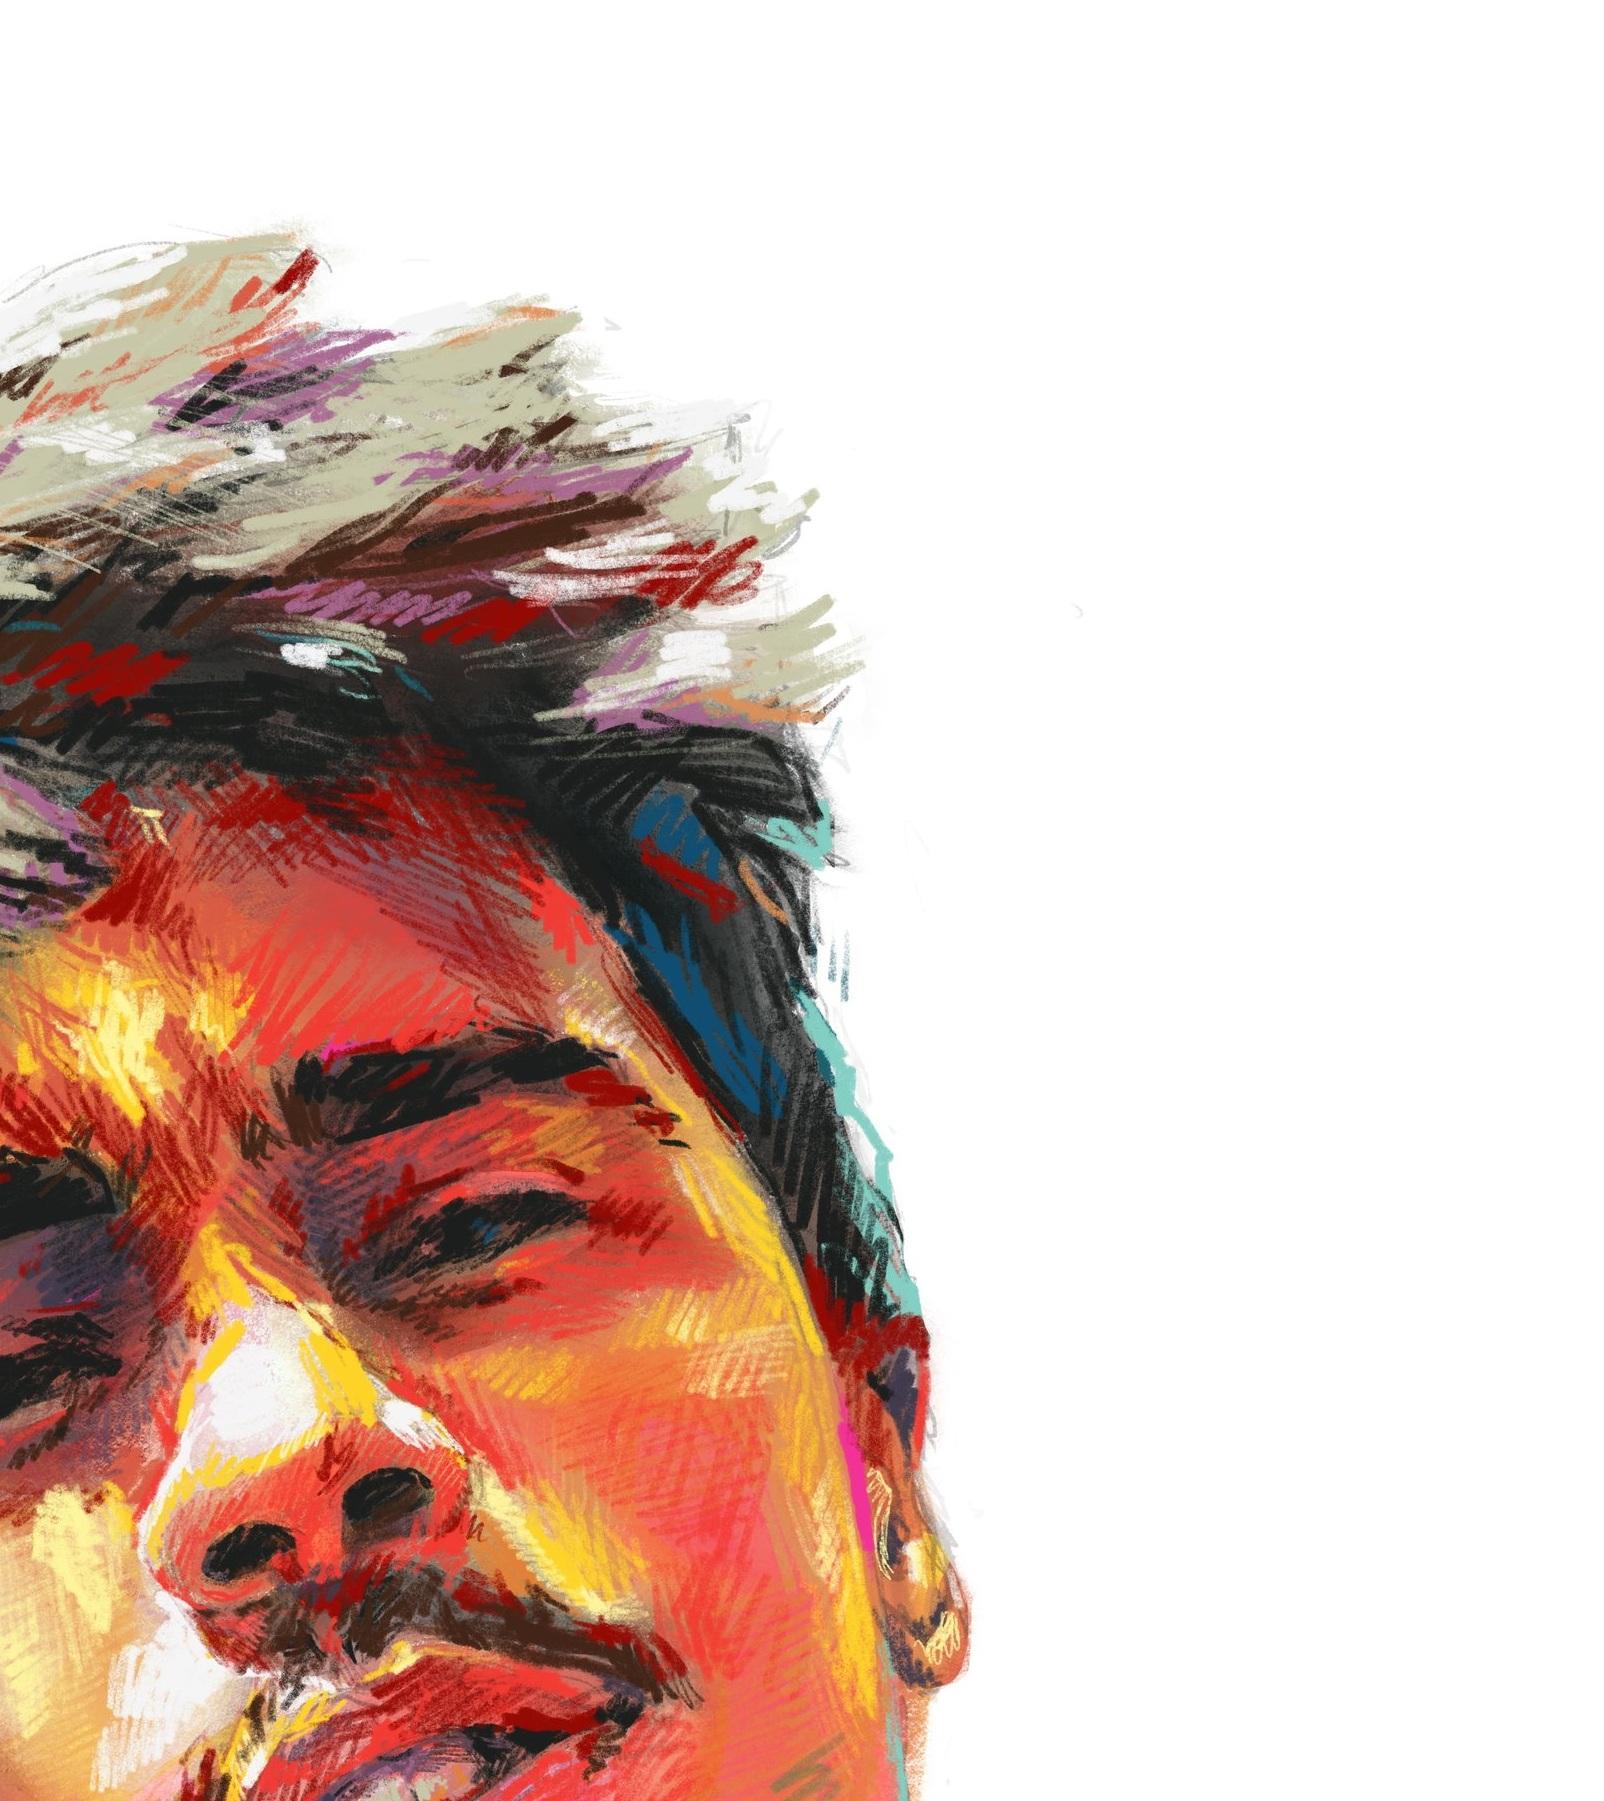 faith+artwork+portrait+man.jpg